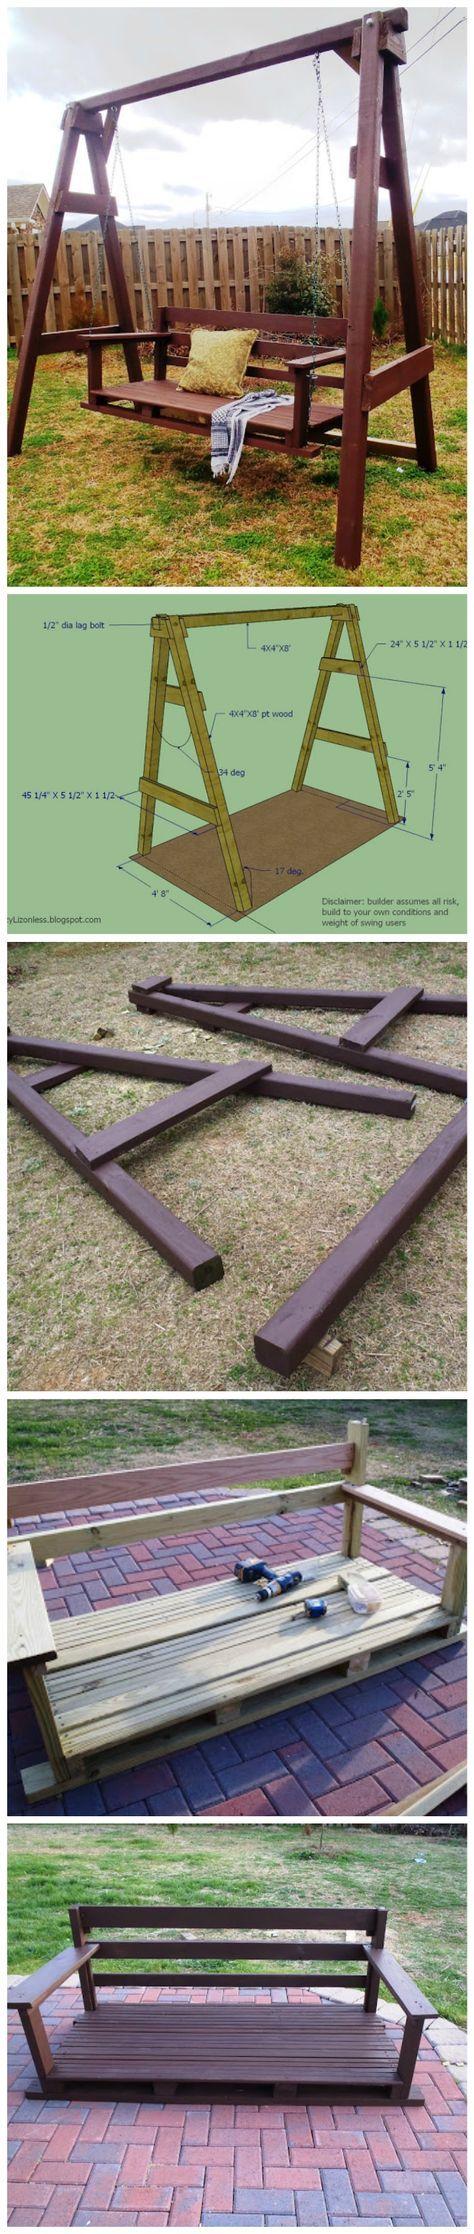 How To Build A Backyard Swing Set   제부도응용   Pinterest   Gärten ...